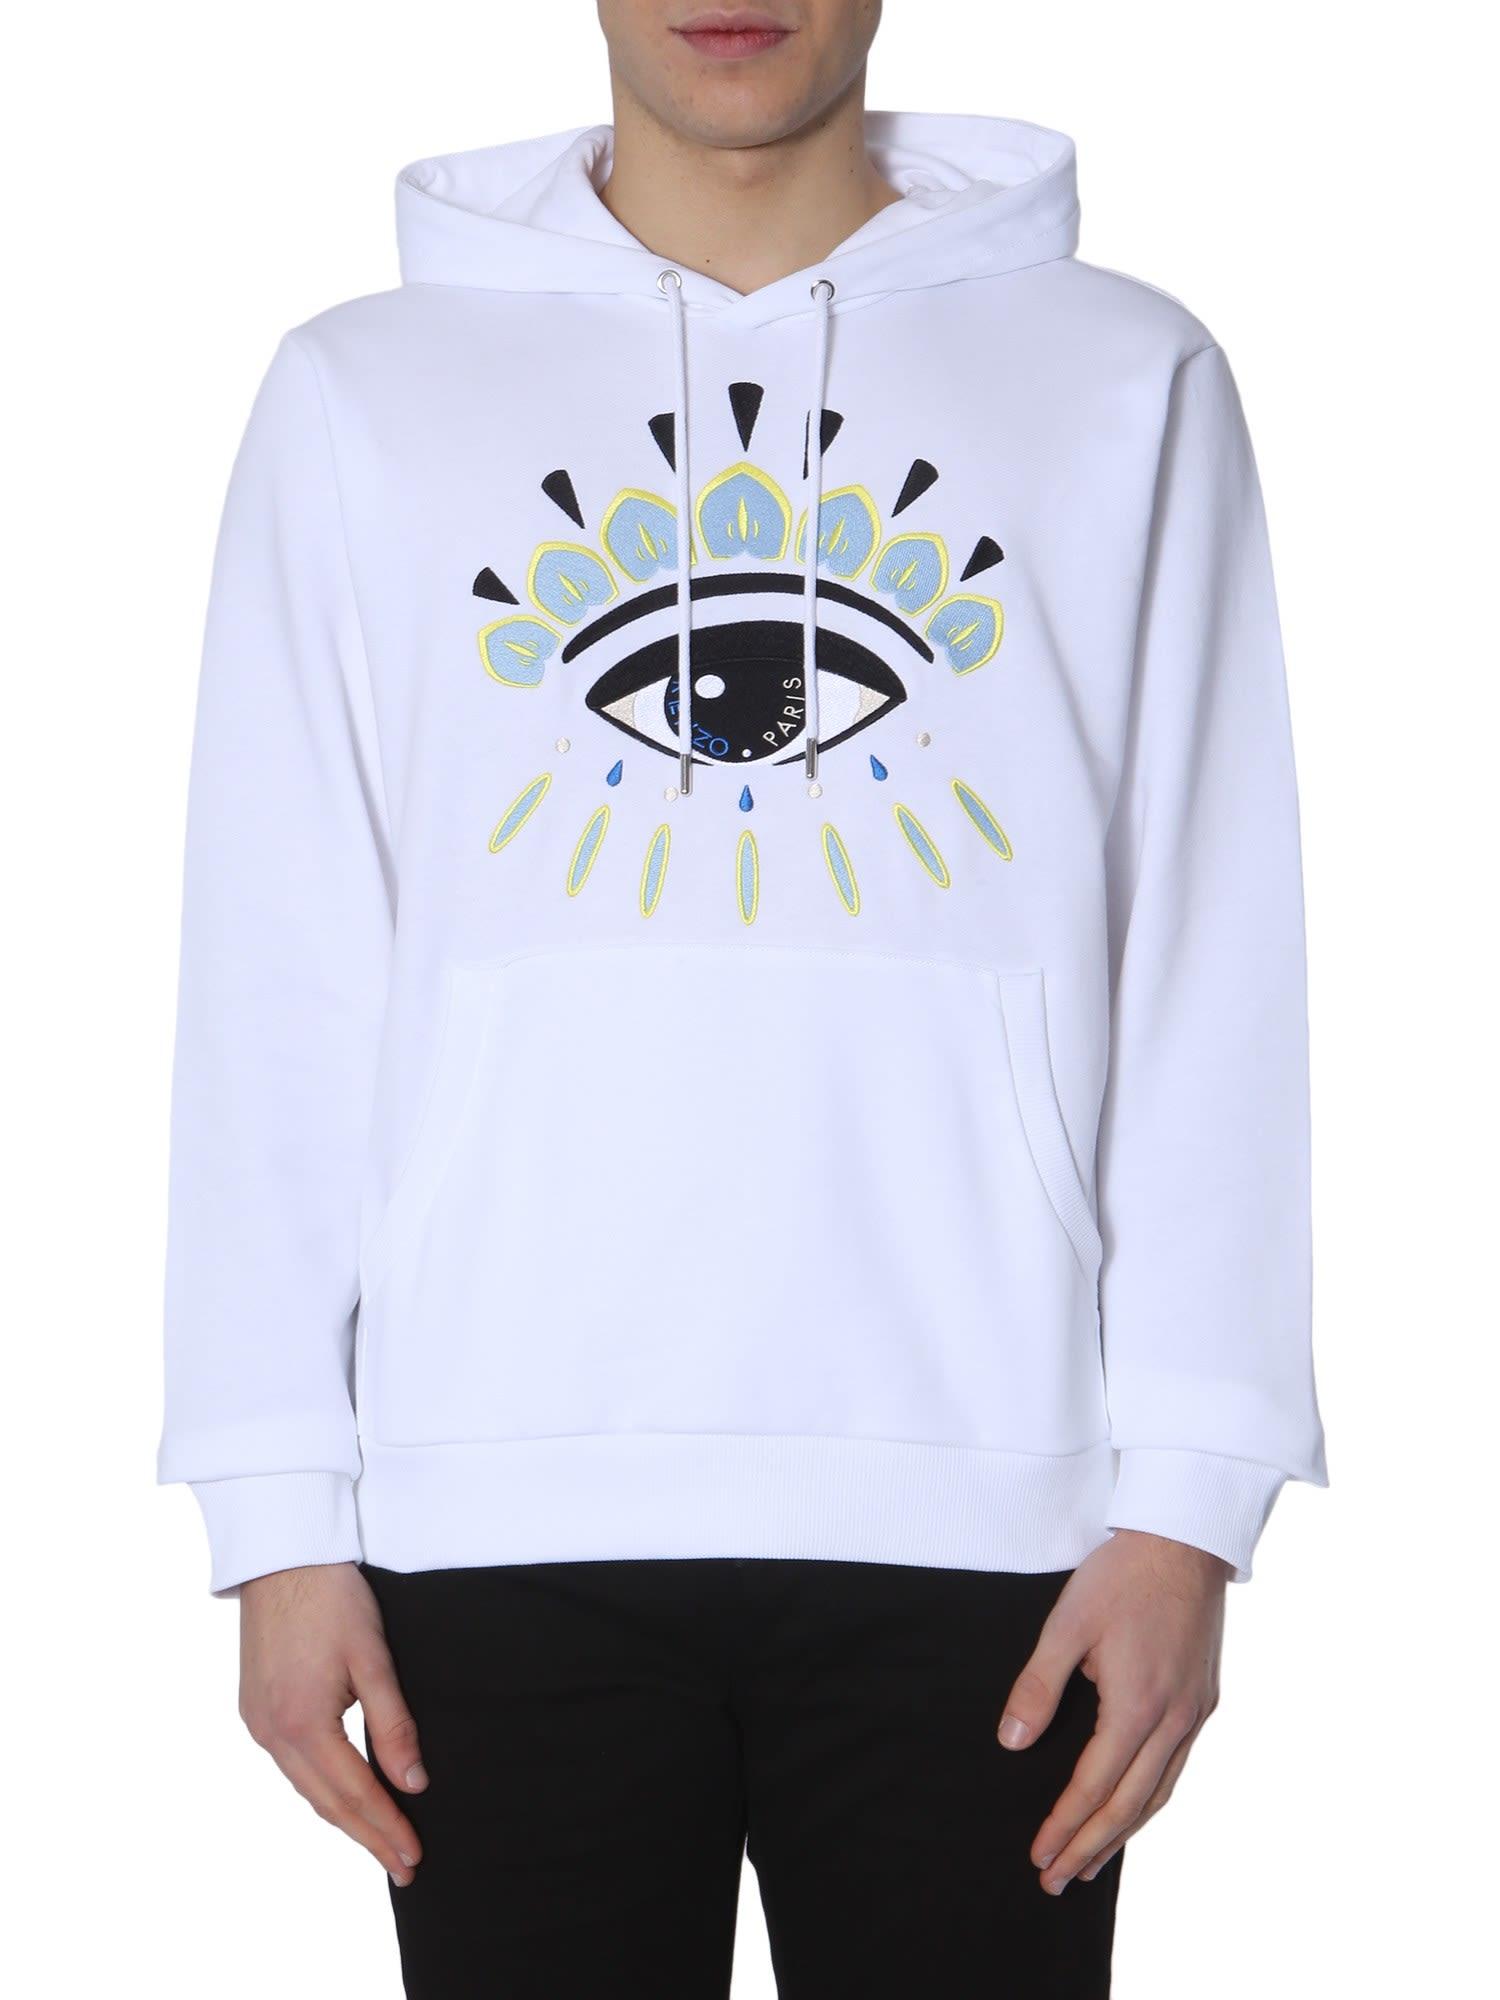 56cb17a6 Kenzo Kenzo Hooded Sweatshirt - White - 10791902 | italist